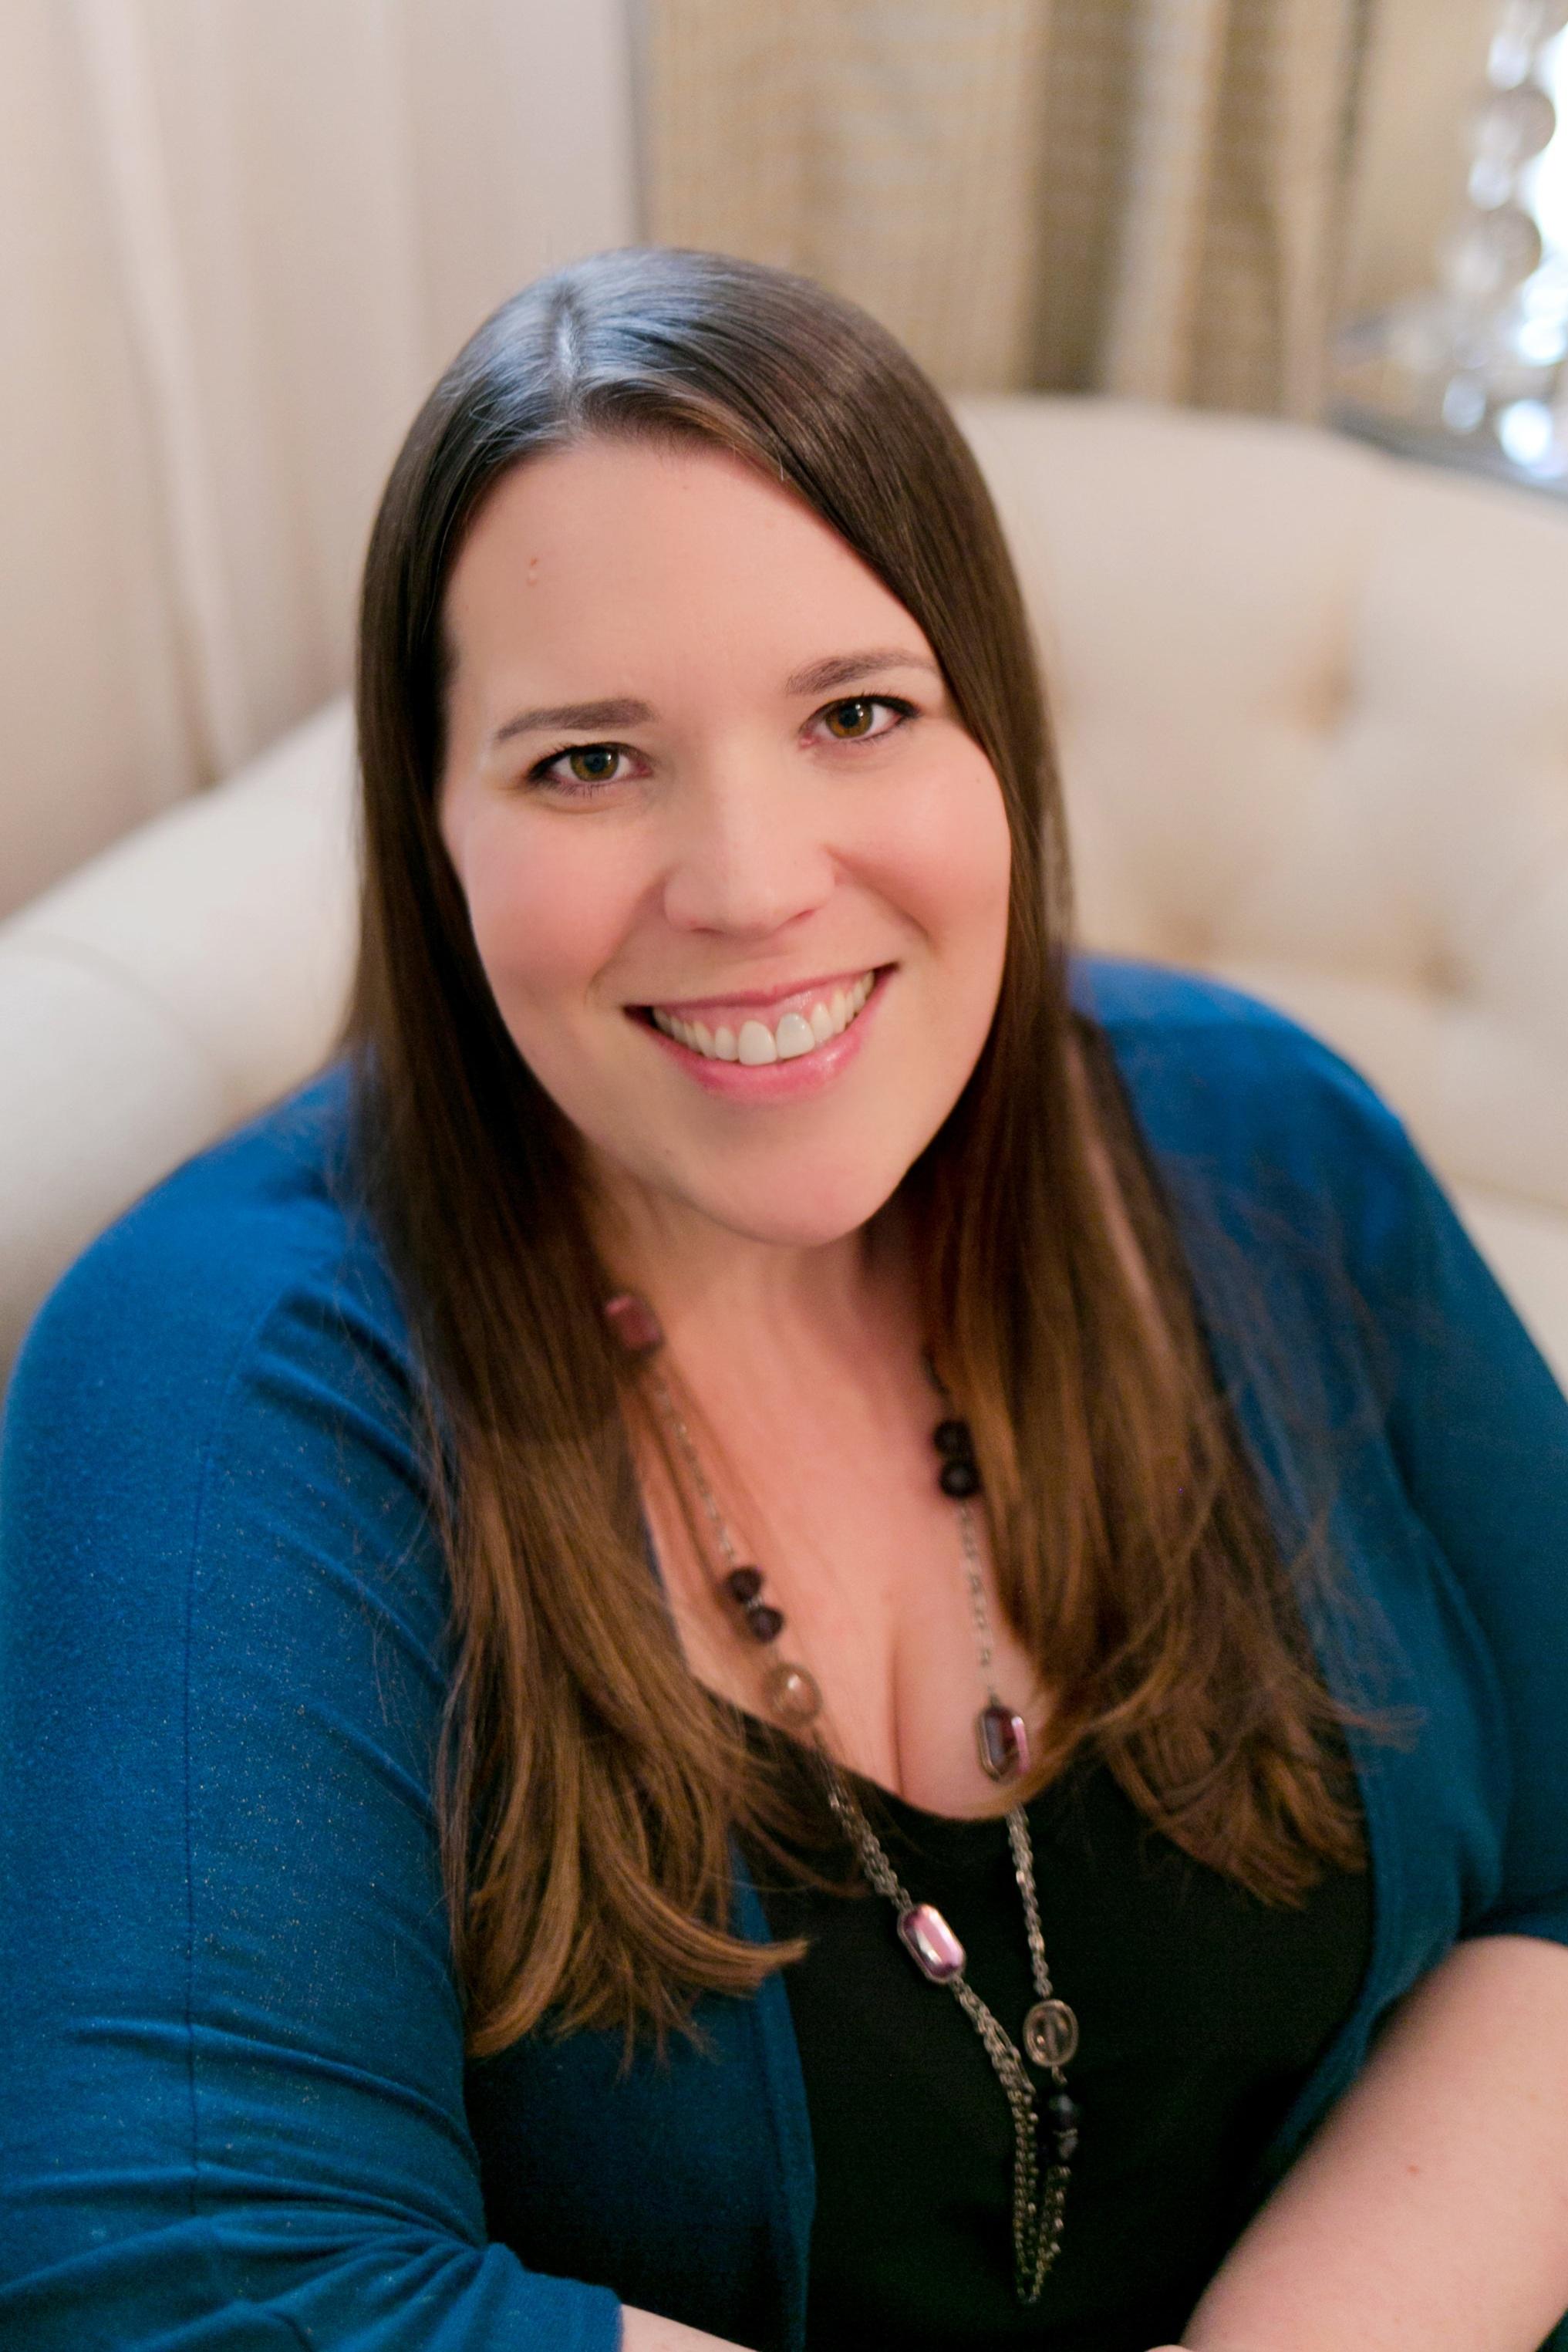 Heather Seguin, LMFT, CSAT - Certified Sex Addiction Therapist in Upland, CA